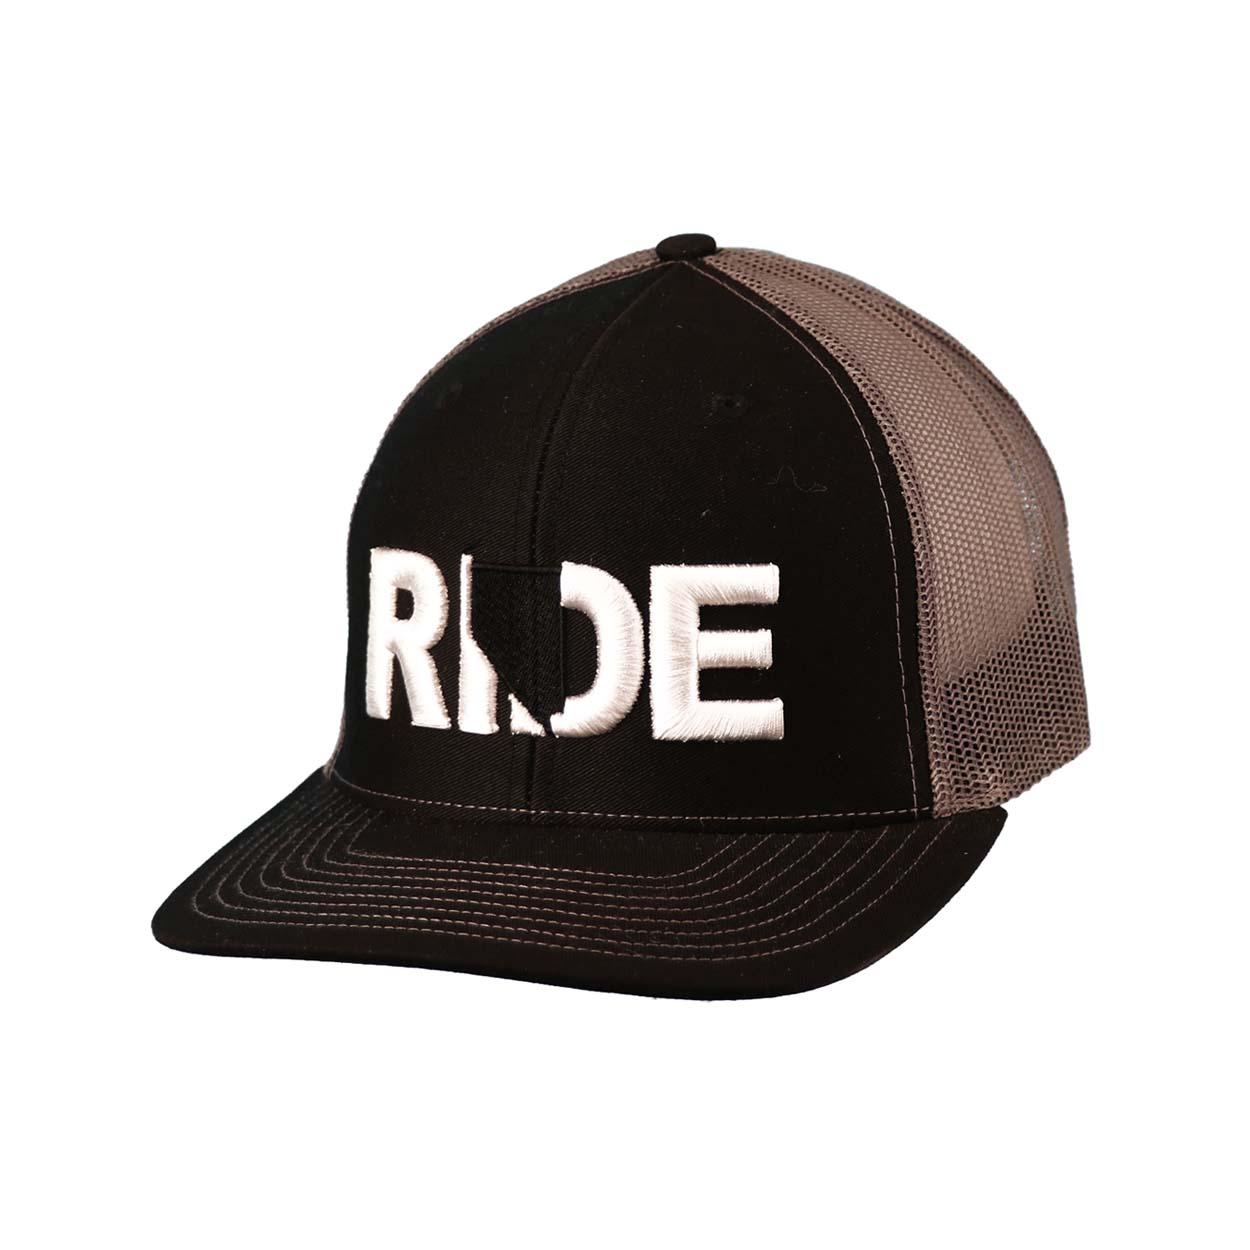 Ride Nevada Classic Embroidered Snapback Trucker Hat Black/White